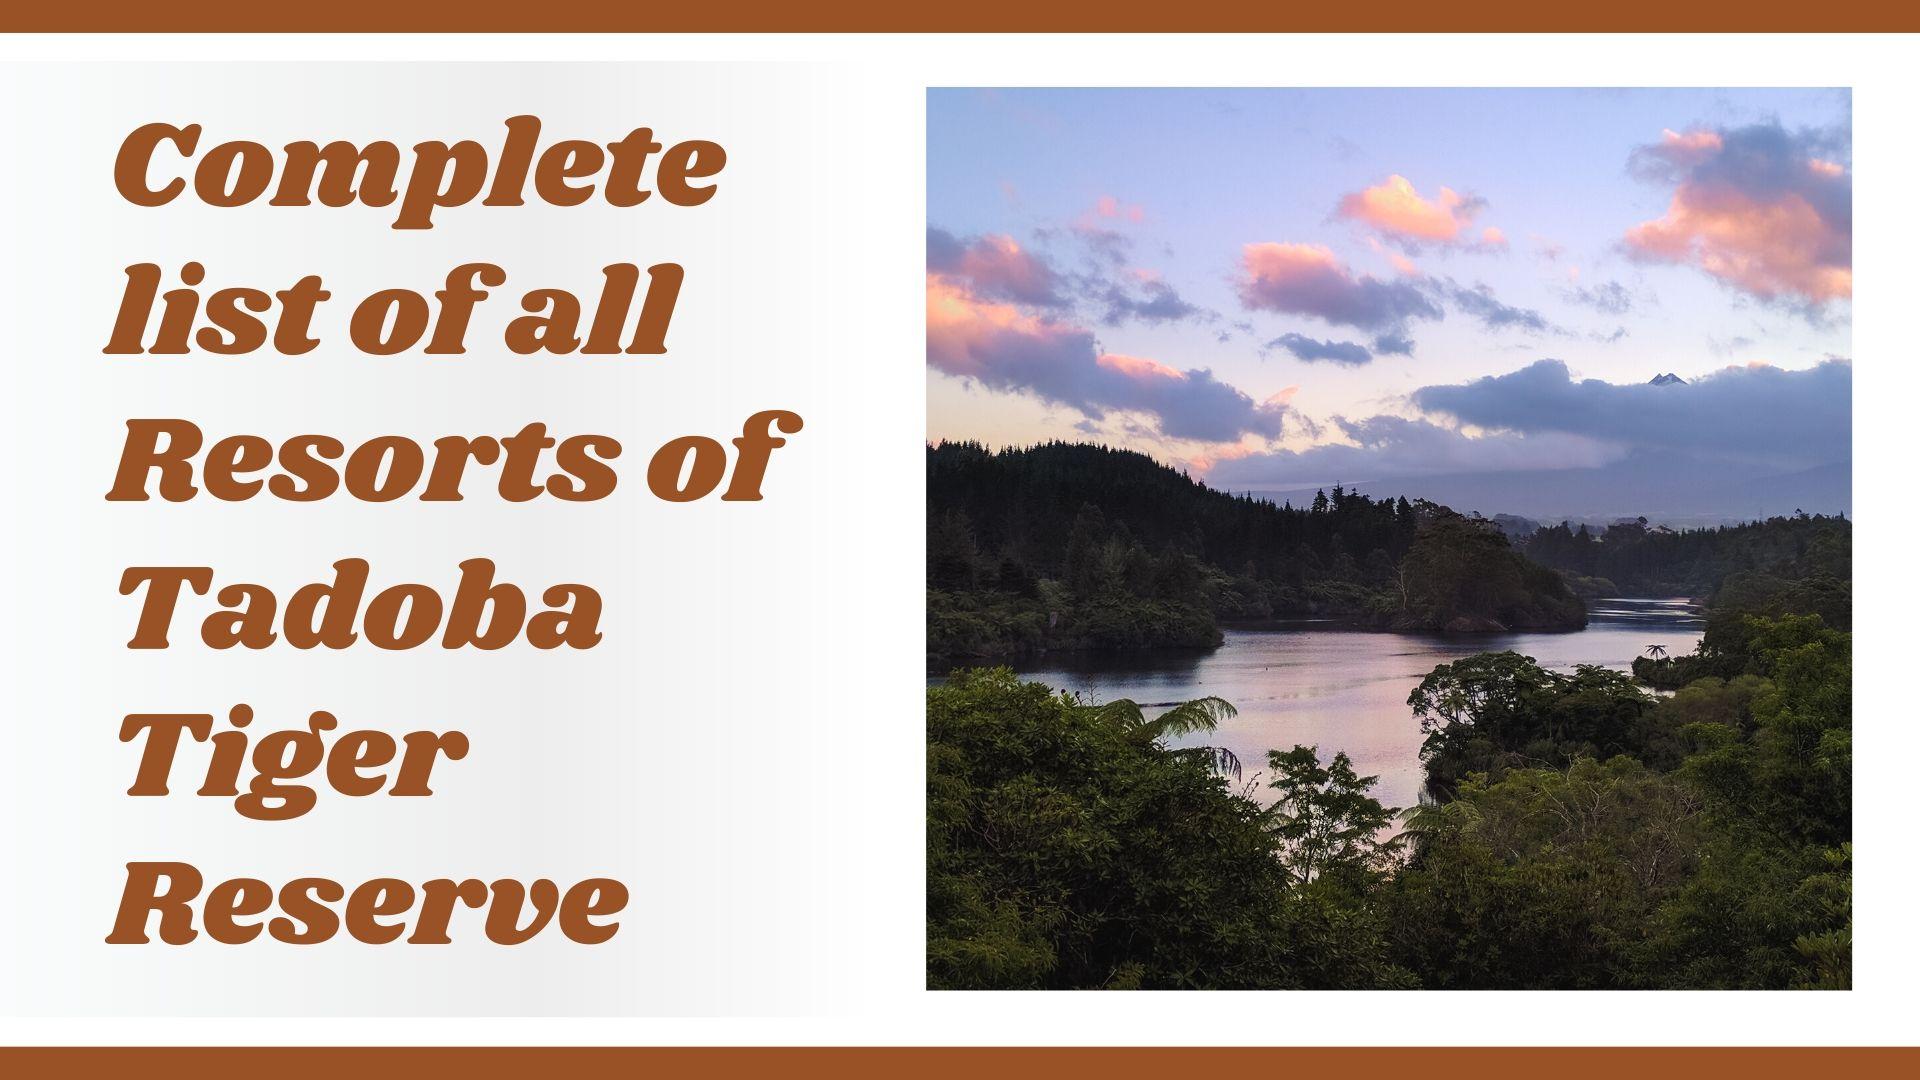 COMPLETE LIST OF TADOBA RESORT